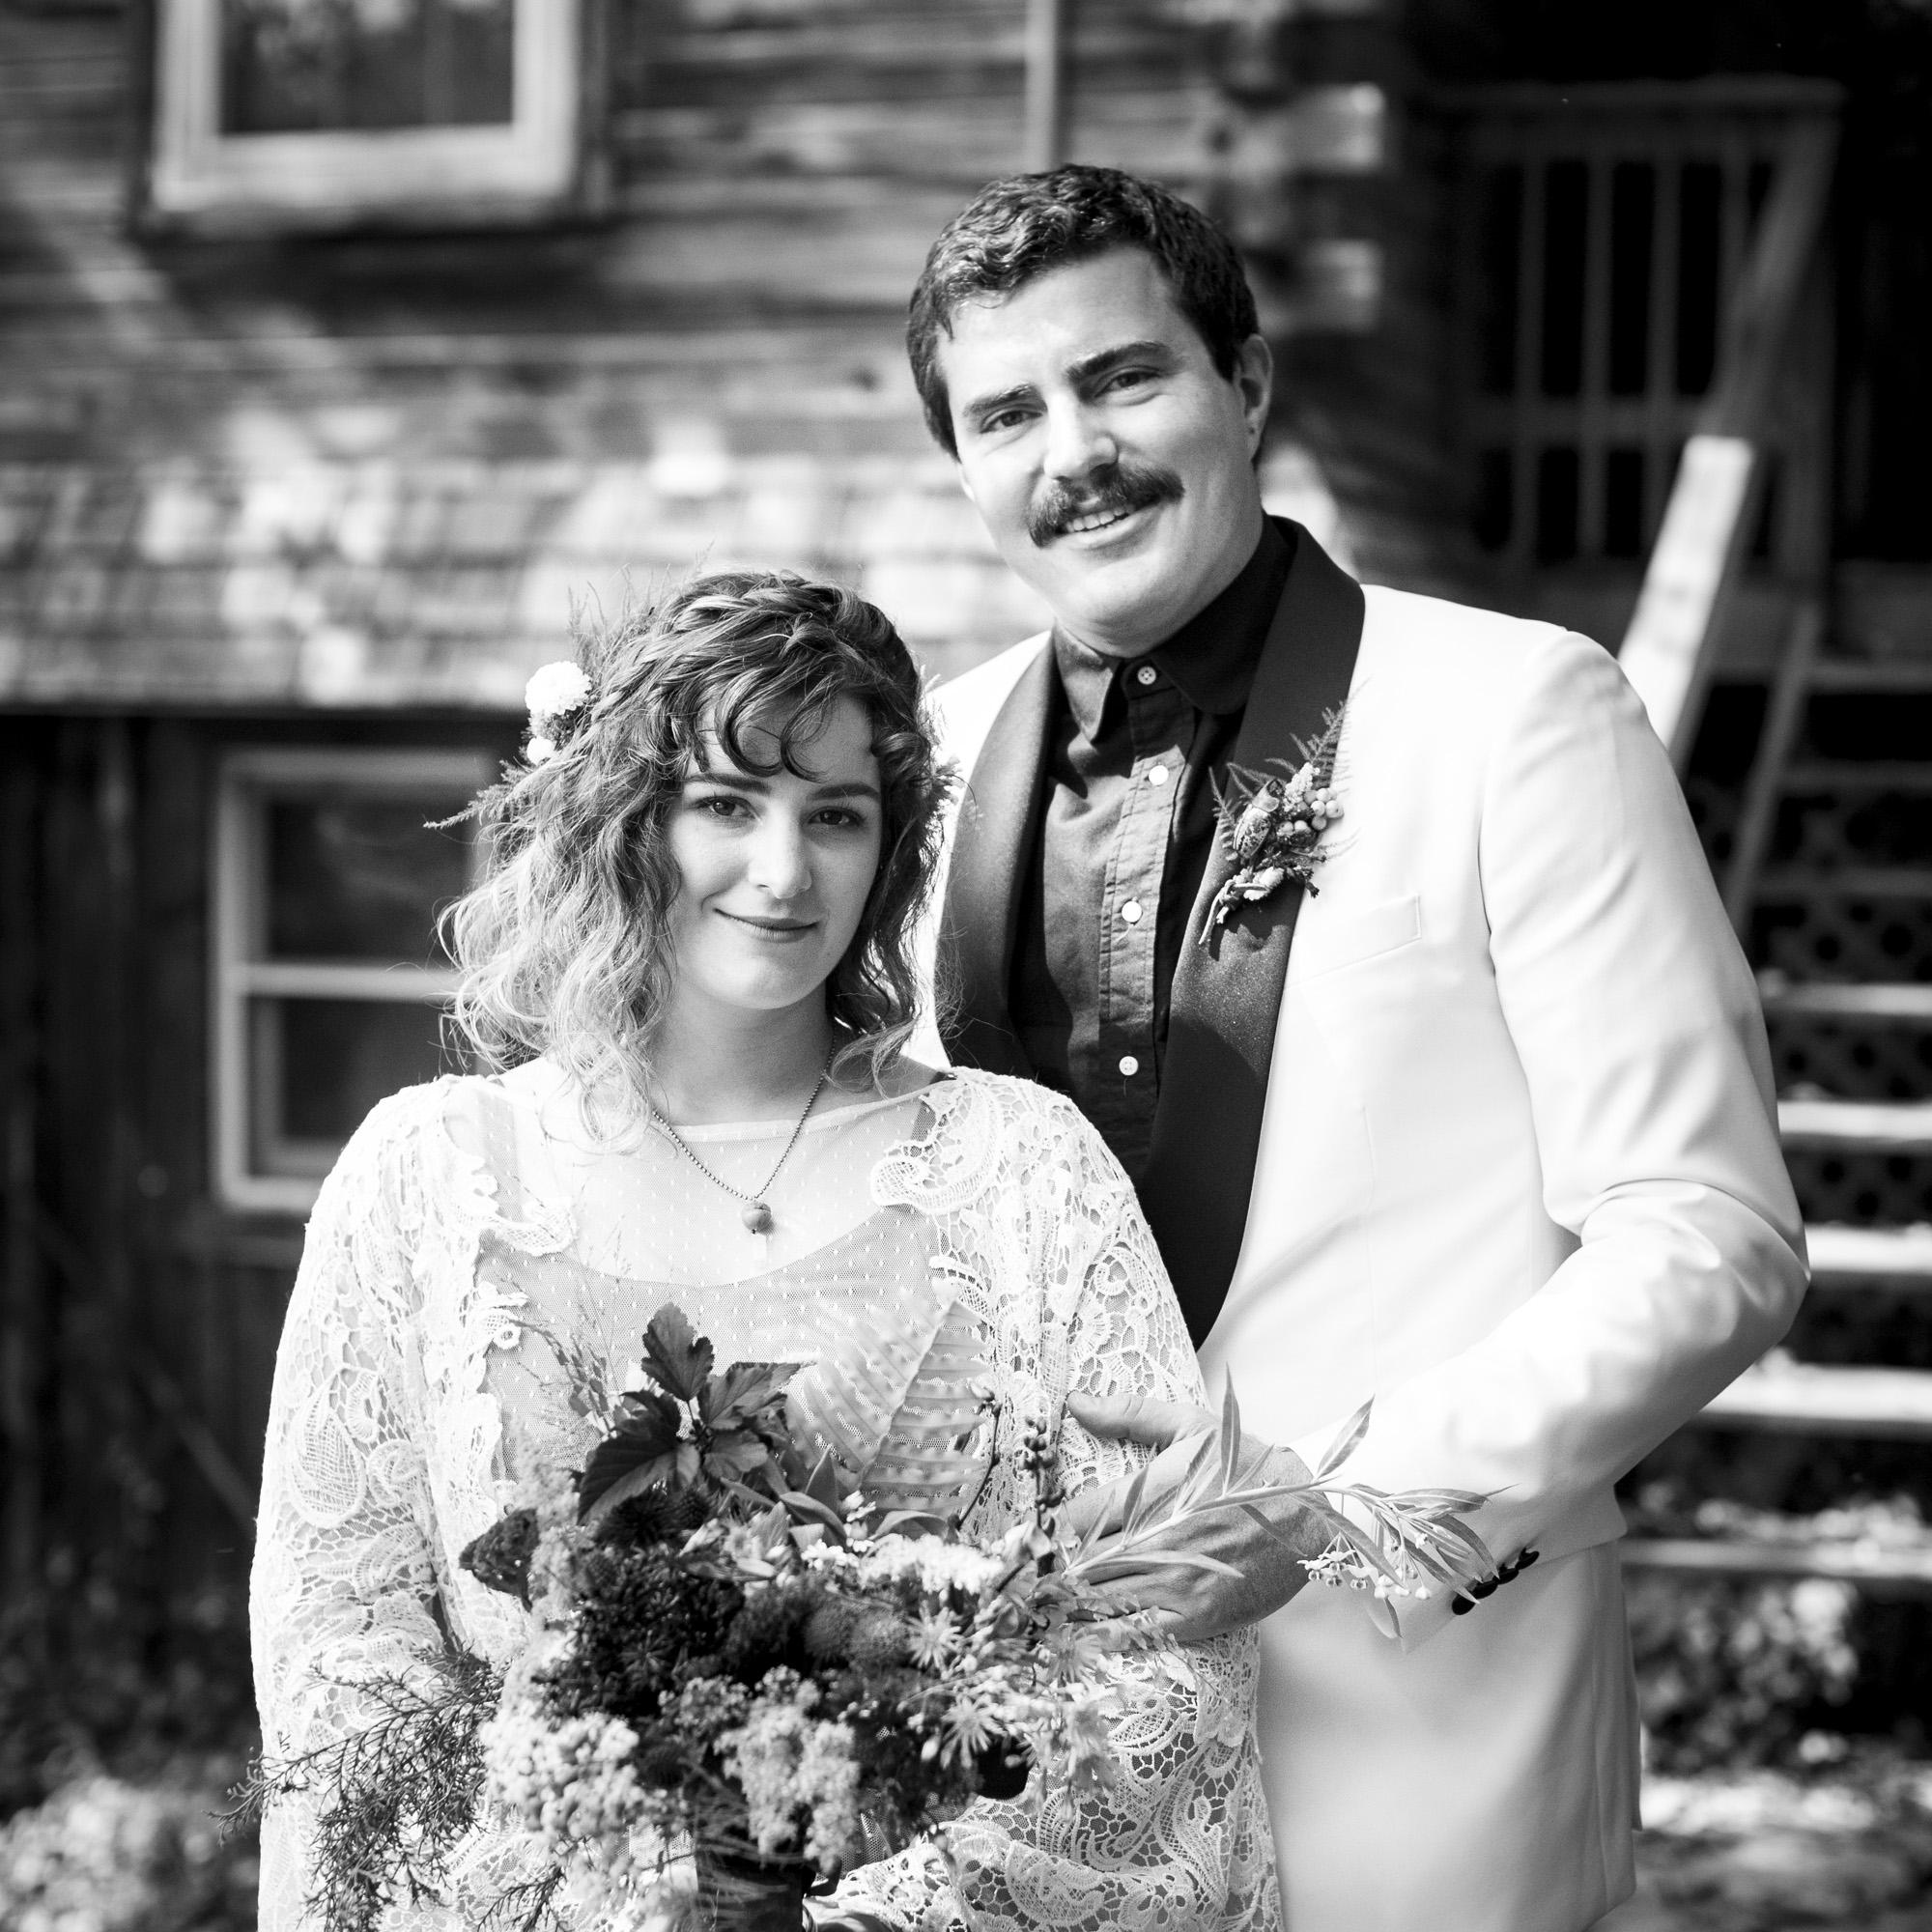 Seriously_Sabrina_Photography_Red_River_Gorge_Kentucky_Wedding_ShawnDana72.jpg